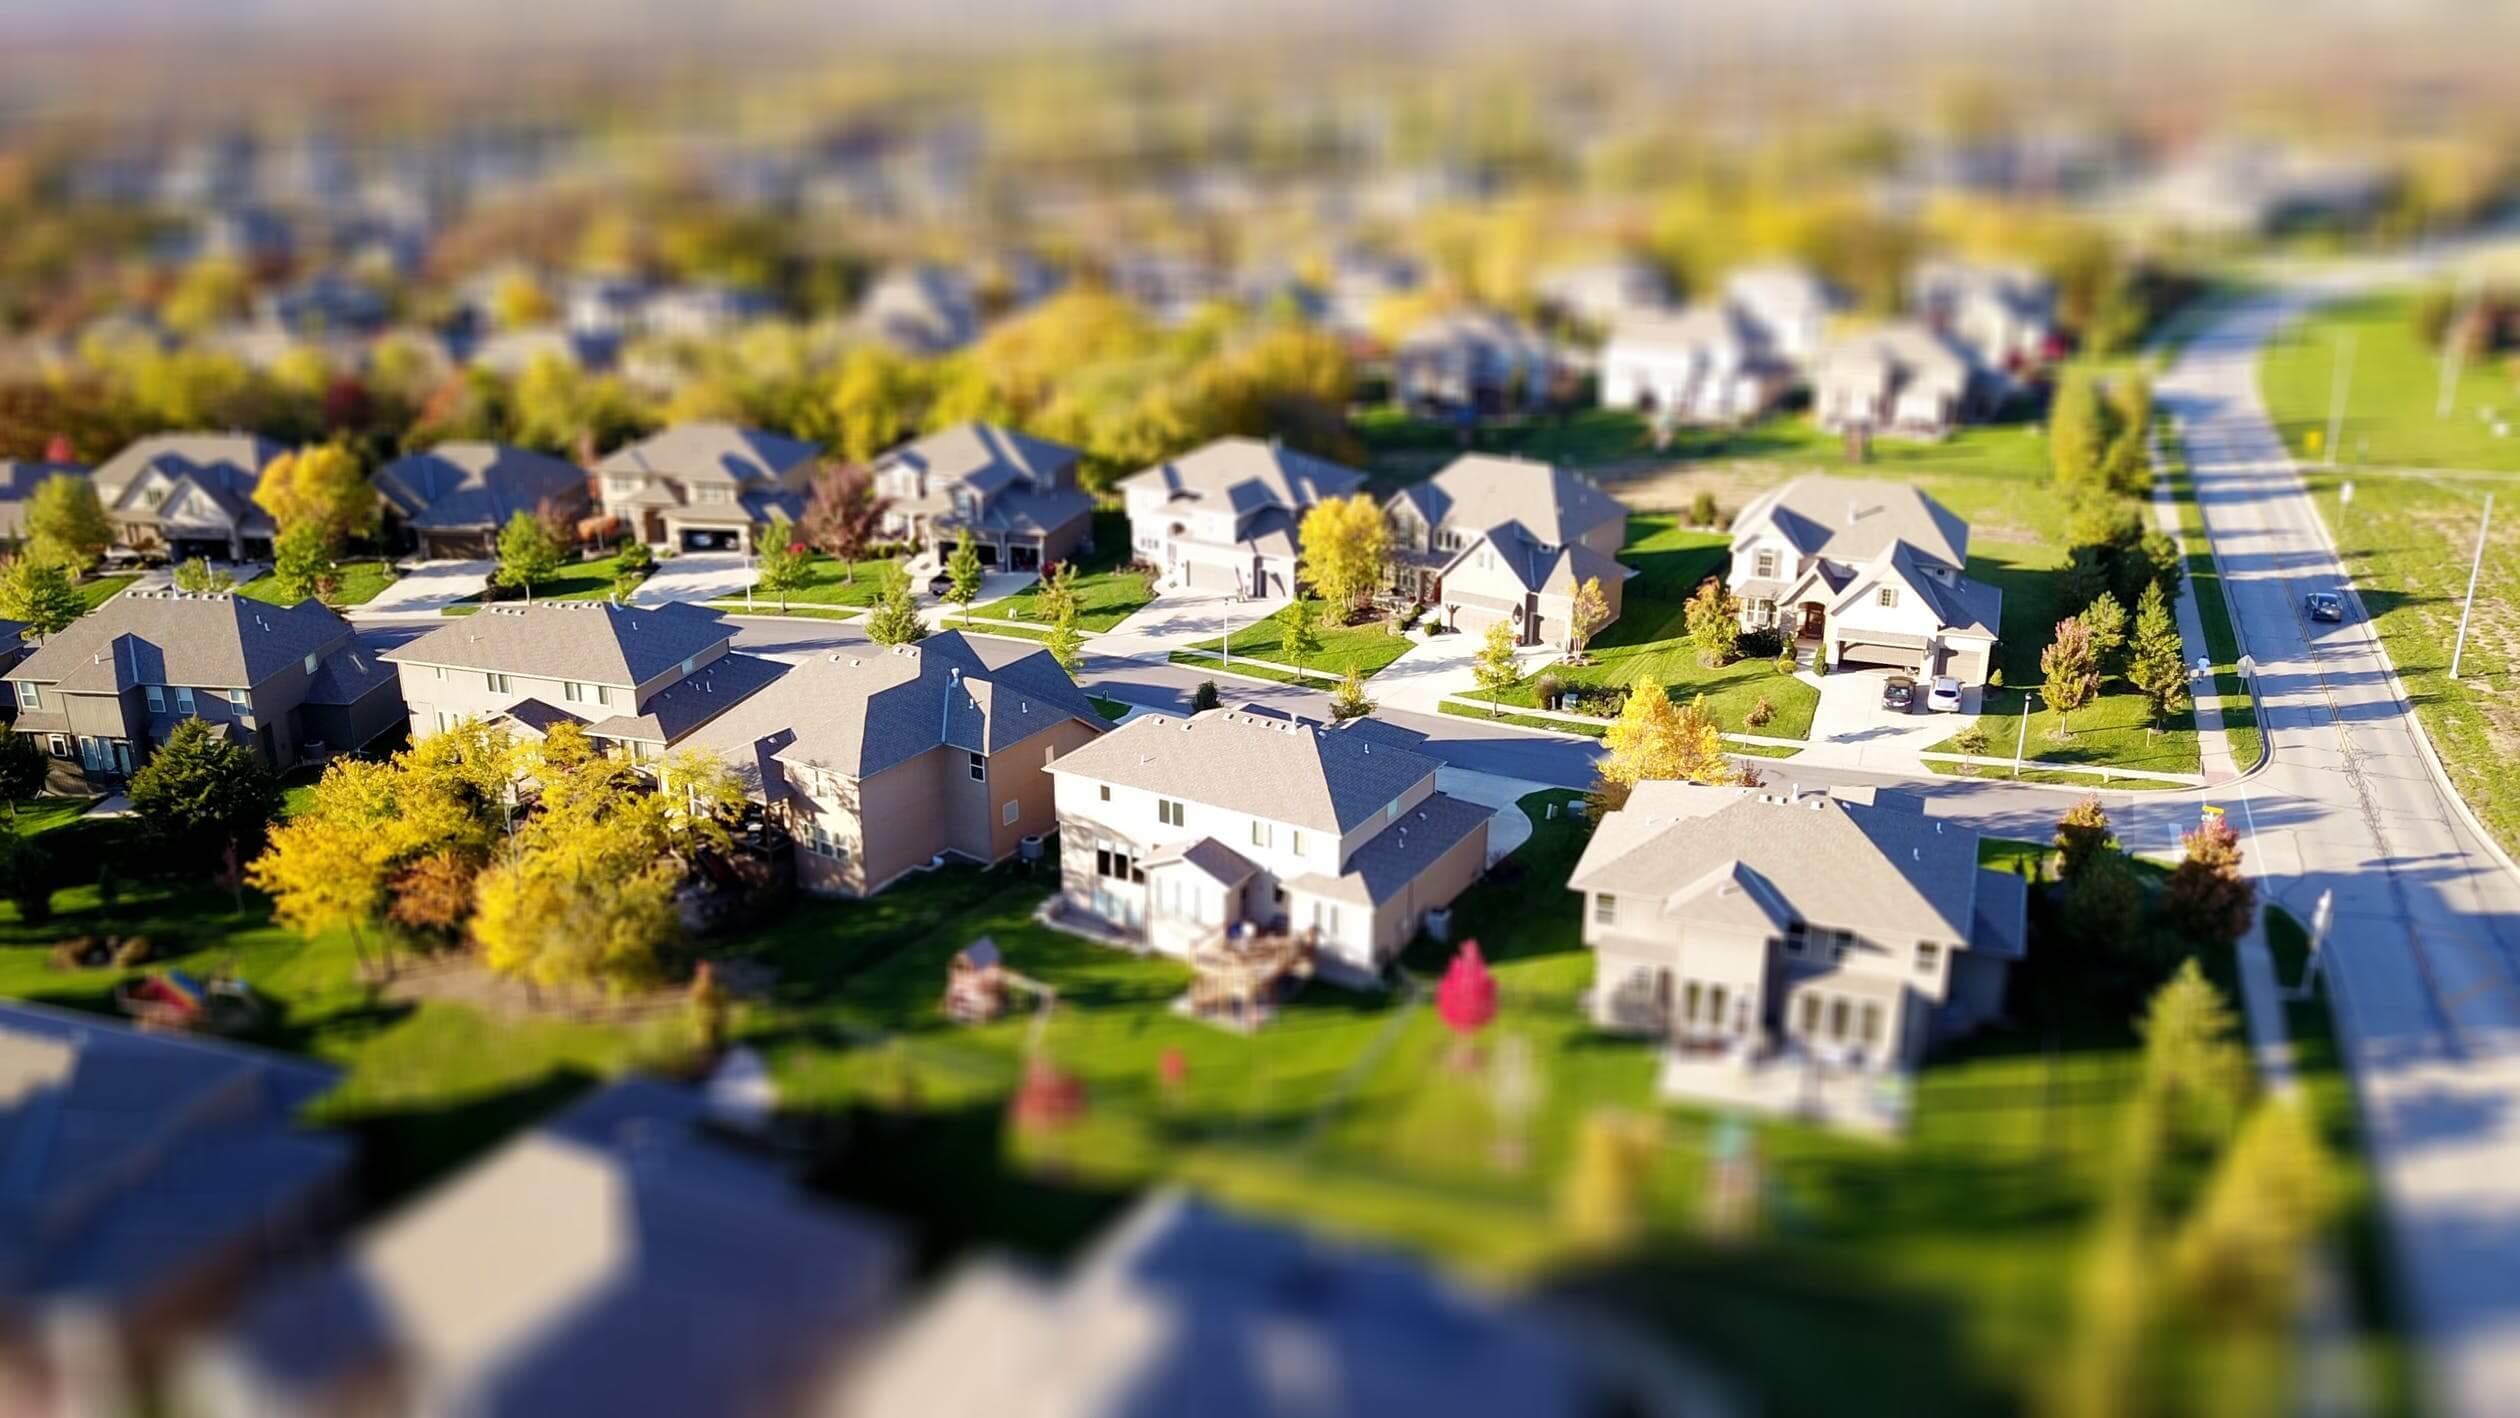 Video Nieuwsuur: Major housing shortage in the Netherlands